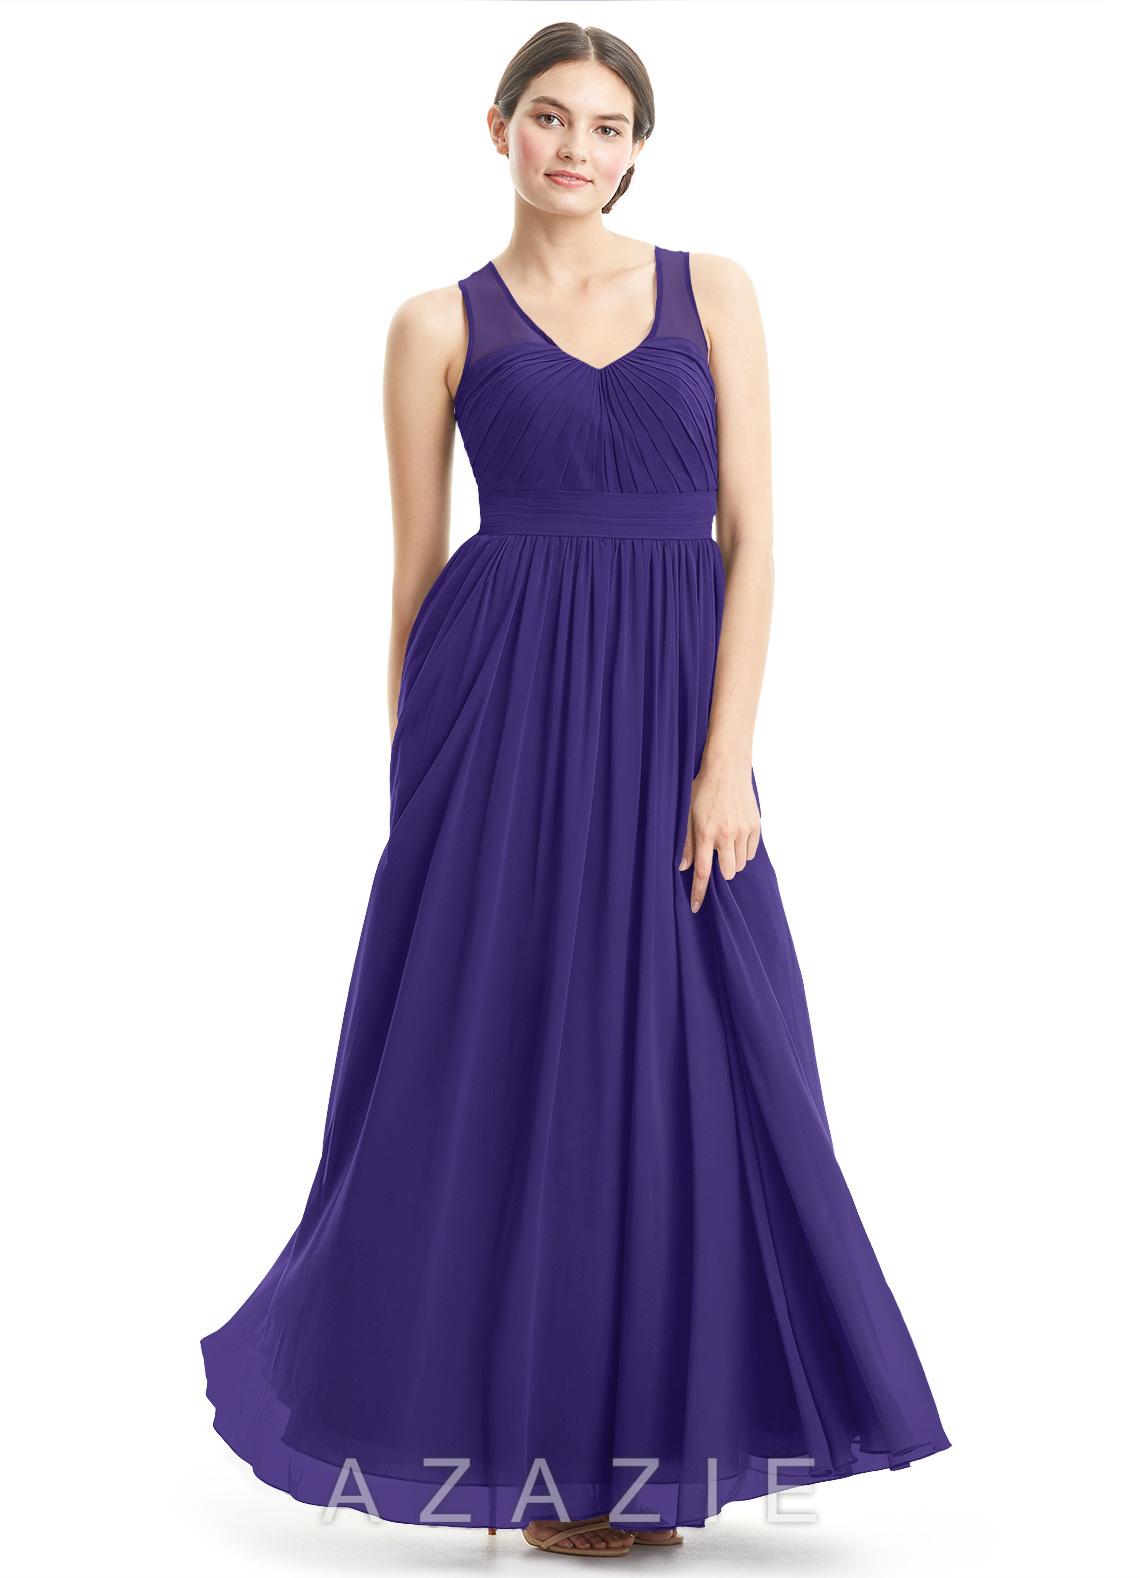 Azazie raquel bridesmaid dress azazie color regency ombrellifo Images